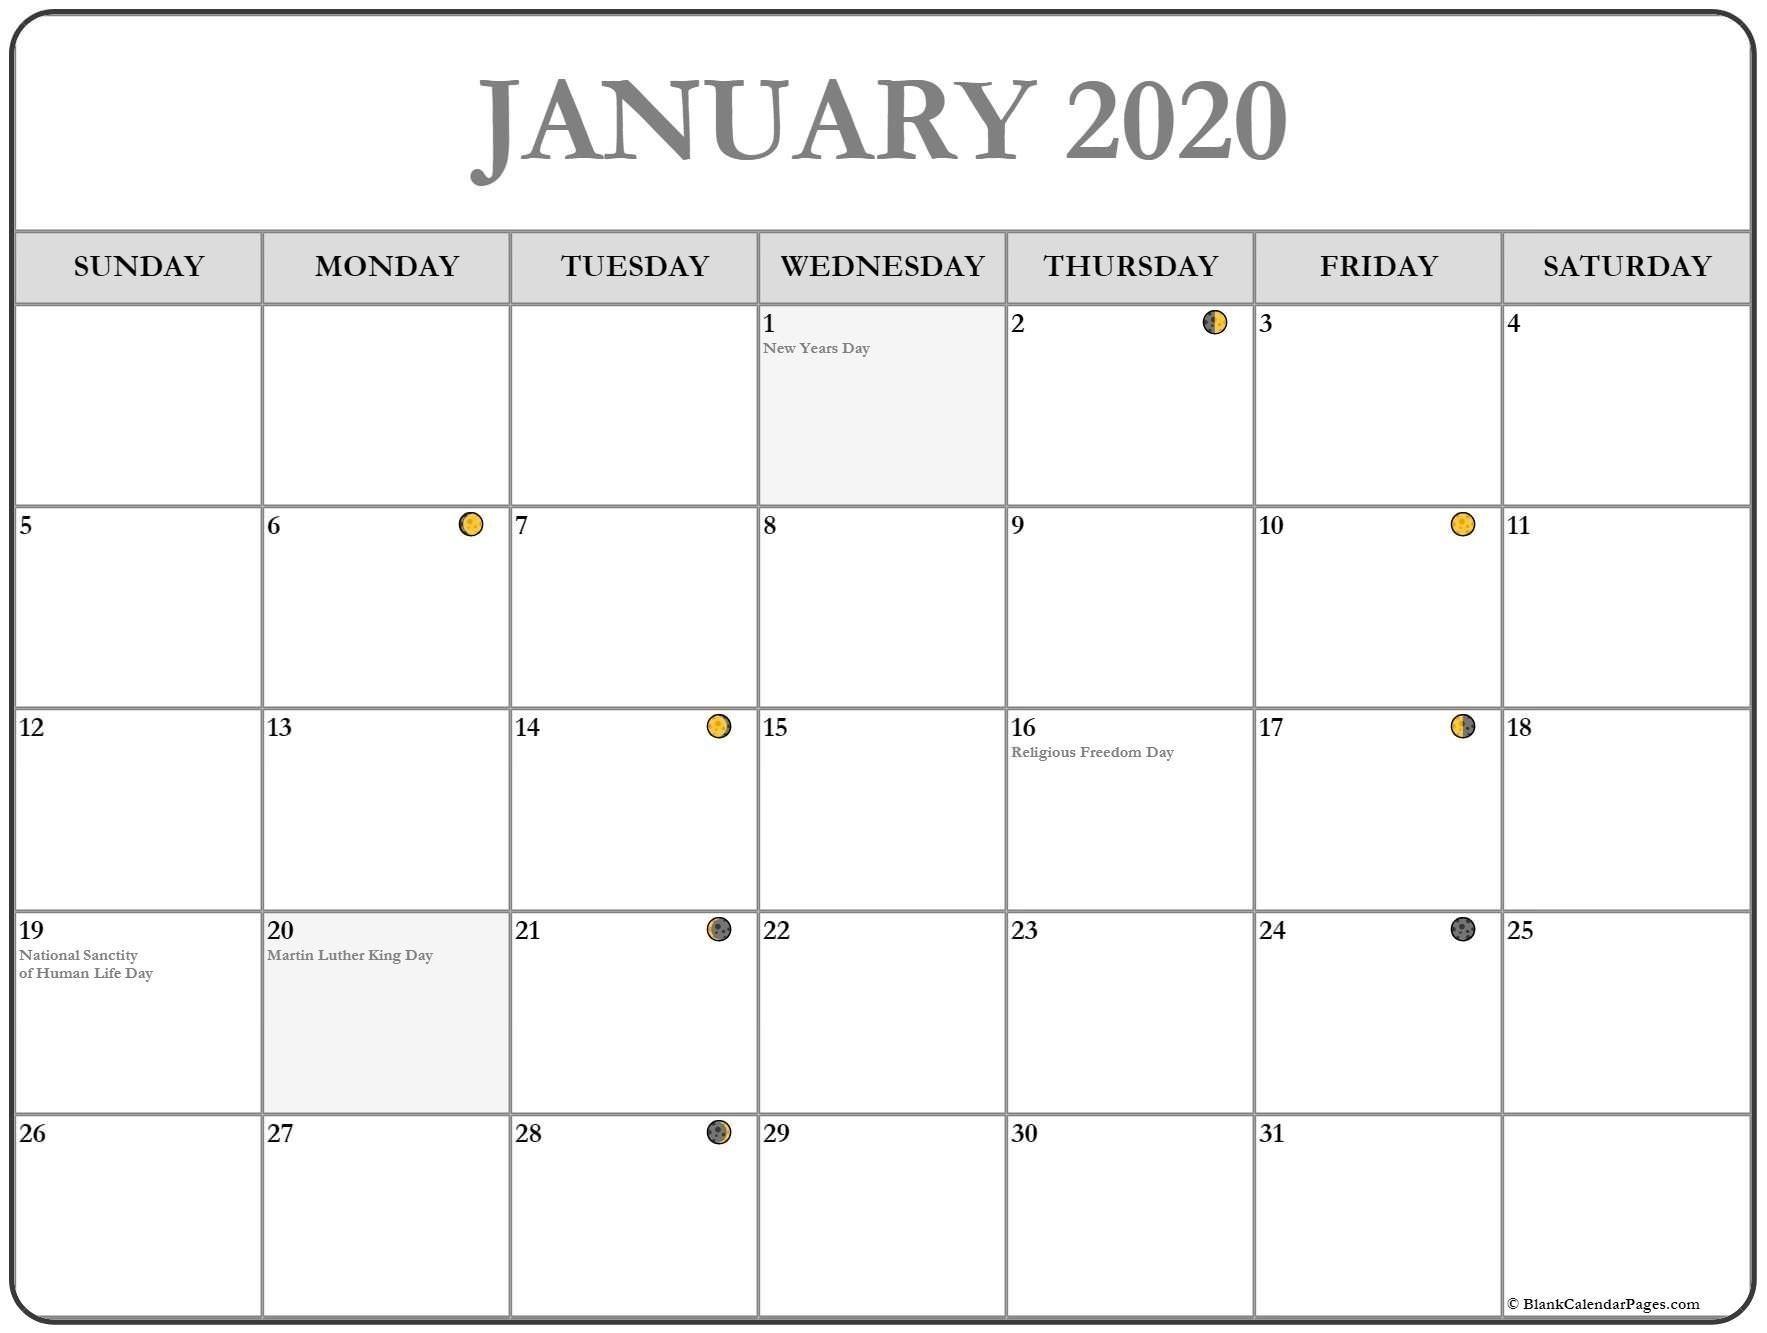 October 2019 Lunar Calendar | Calendar Template-Lunar Calendar January 2020